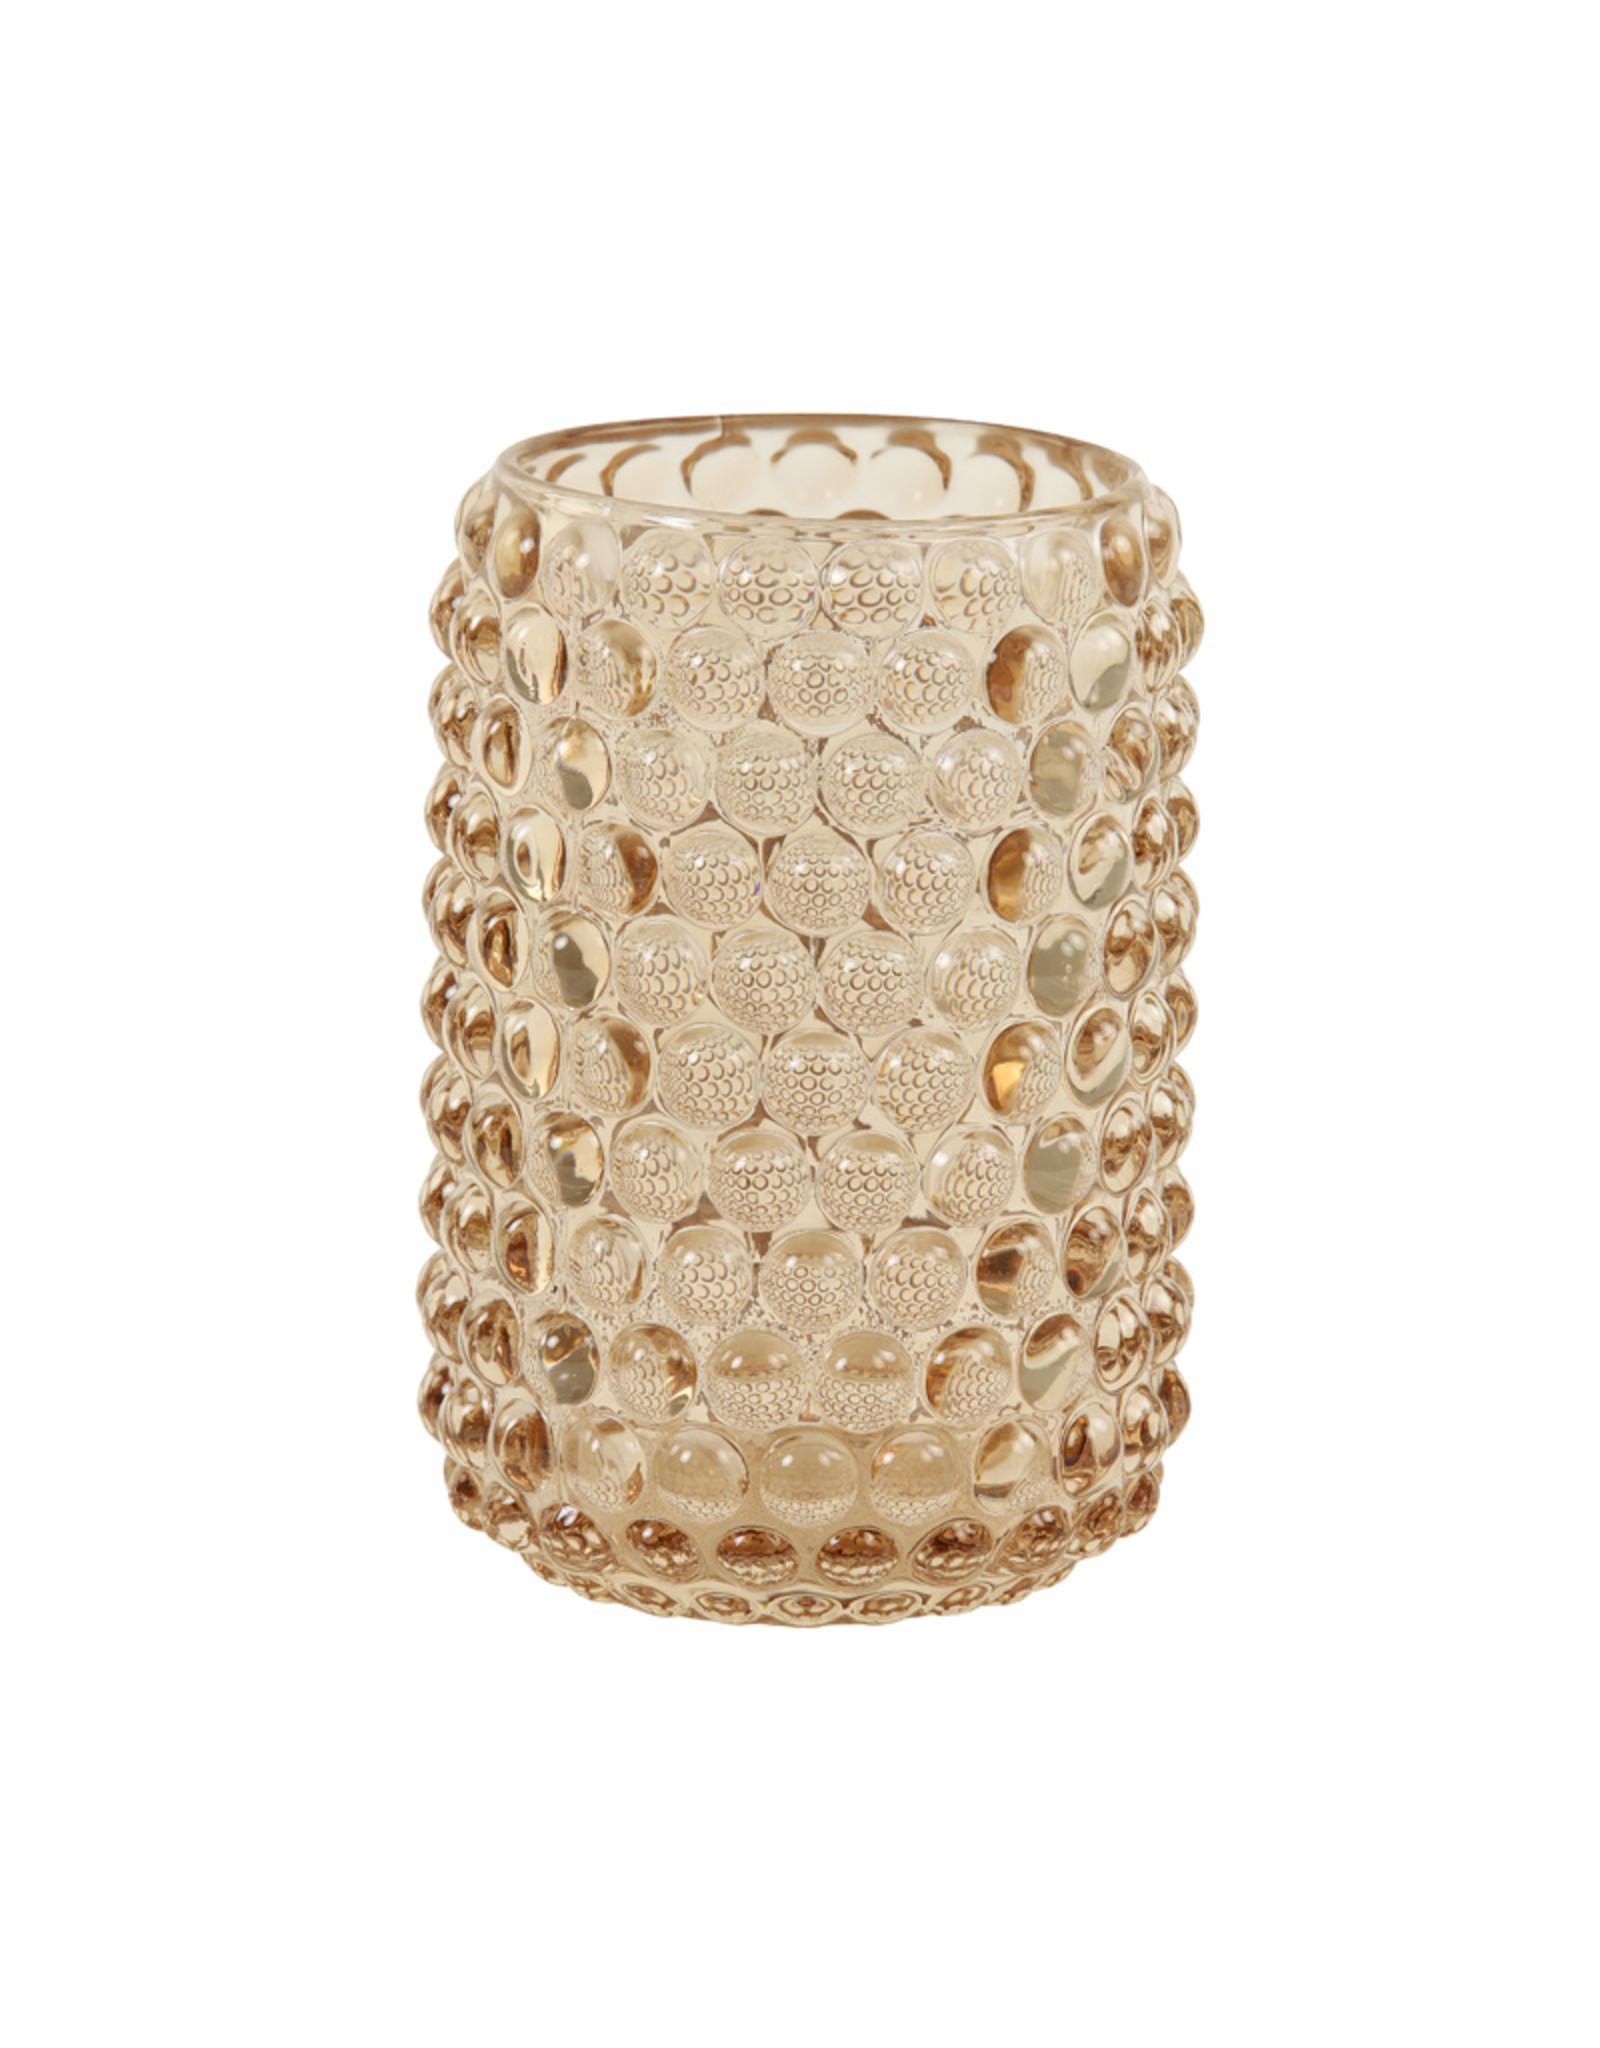 Light & Living Theelicht Ø9x12,5 cm PALET glas karamel